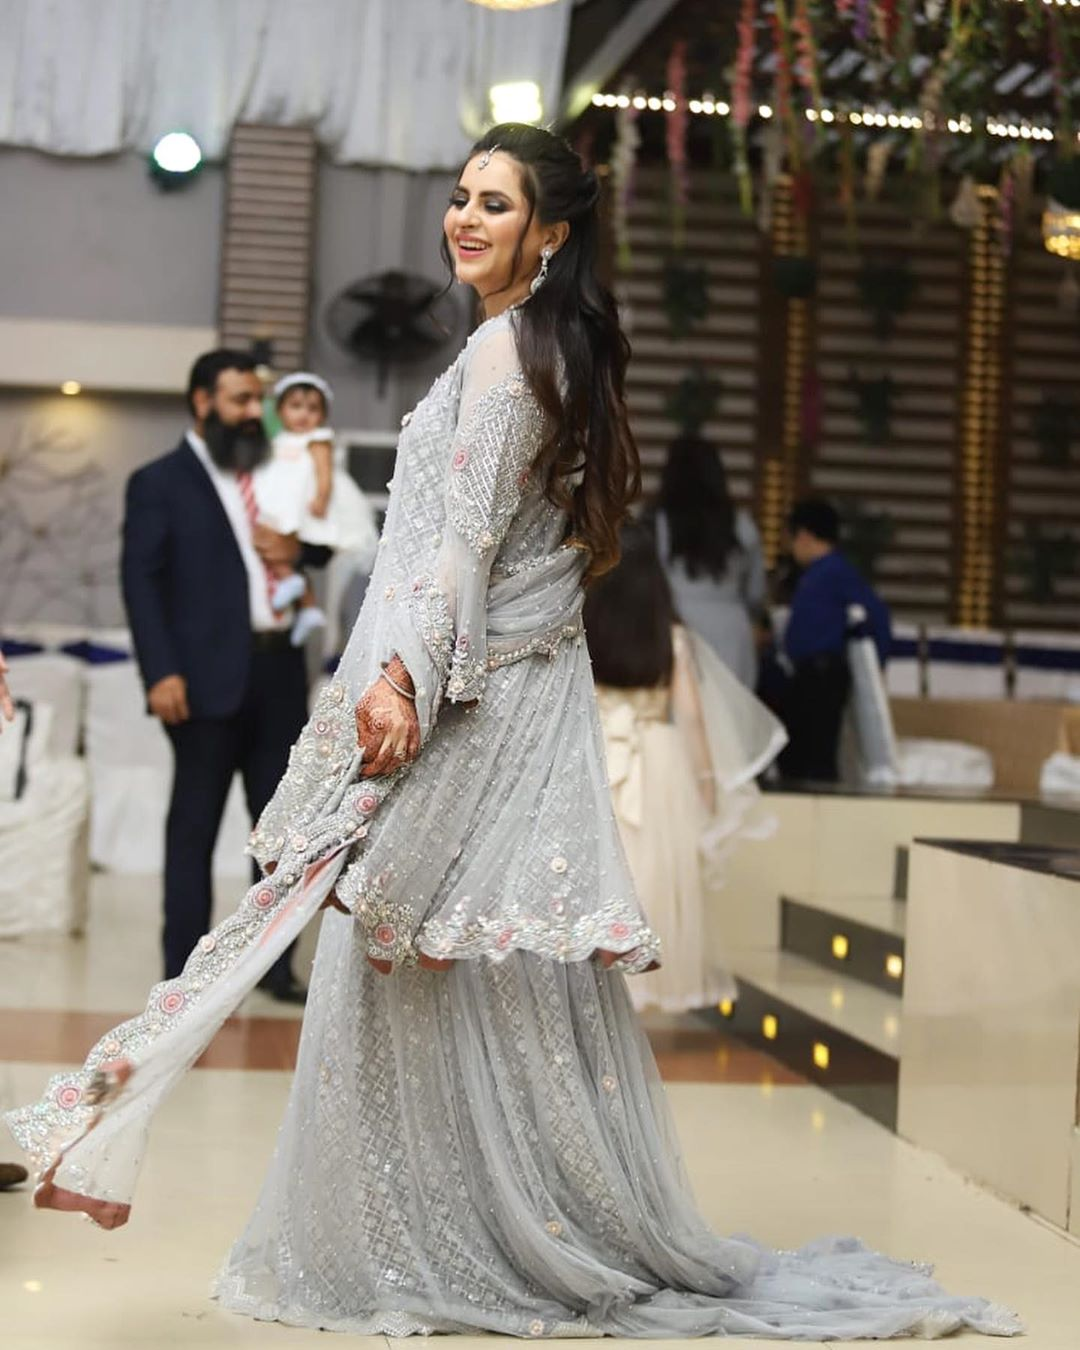 Arsalan Kanwar with Wife Fatima Effendi Beautiful Clicks From A Wedding Event